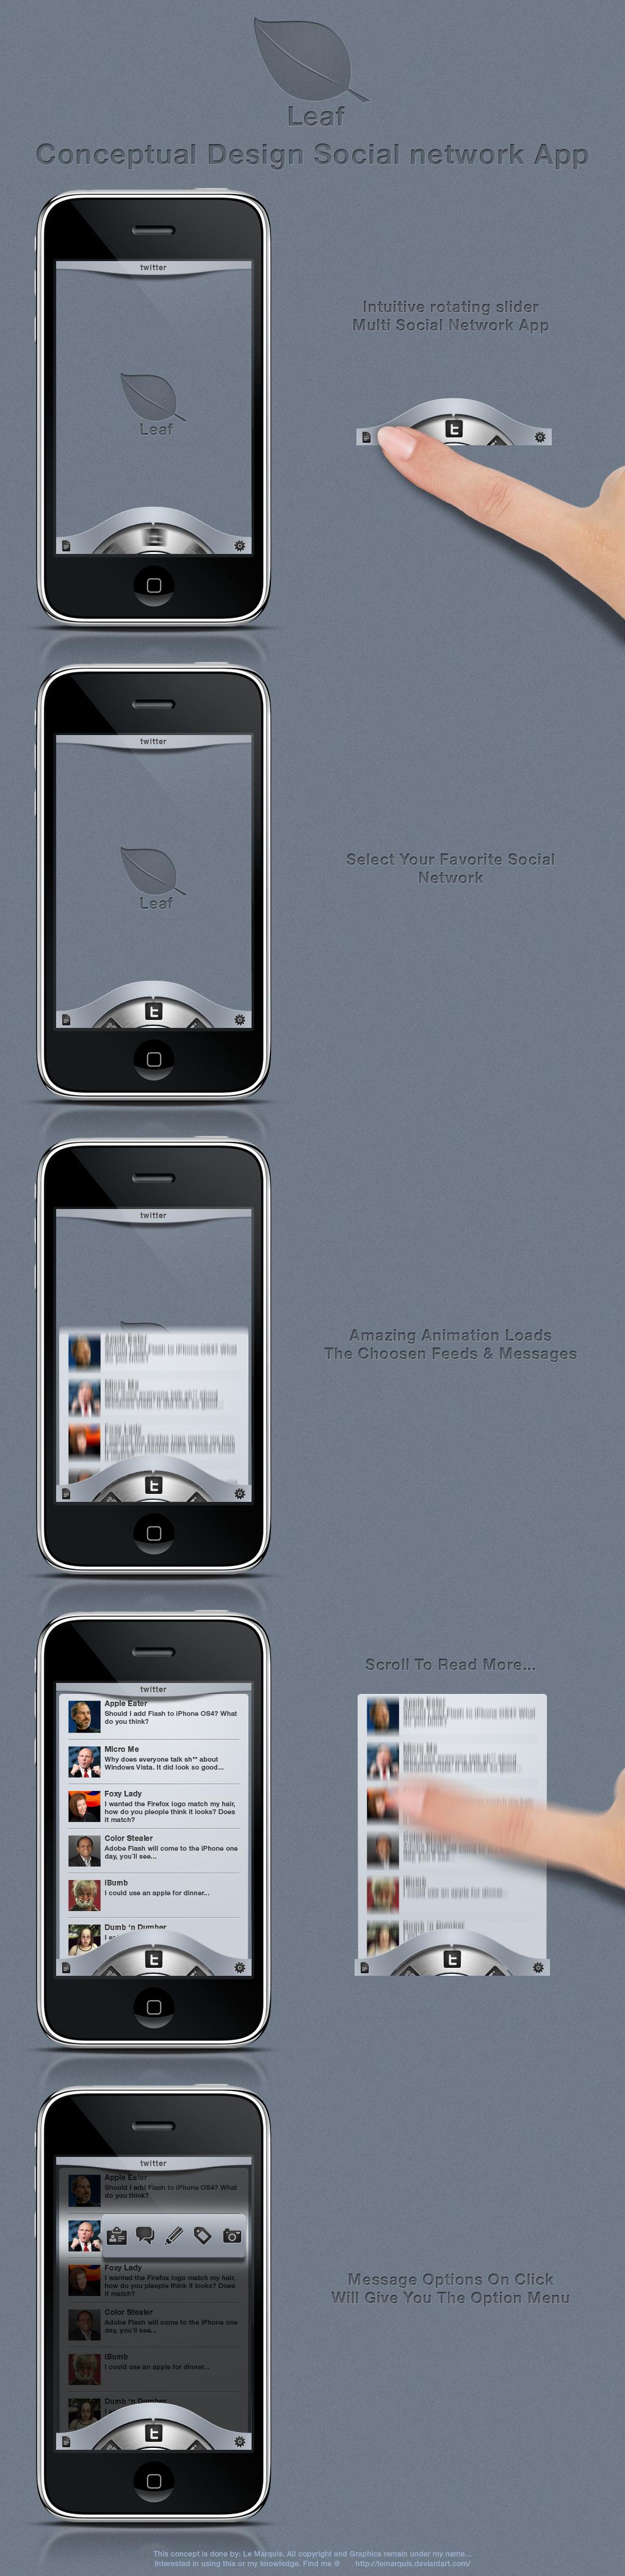 Leaf - Conceptual App Design